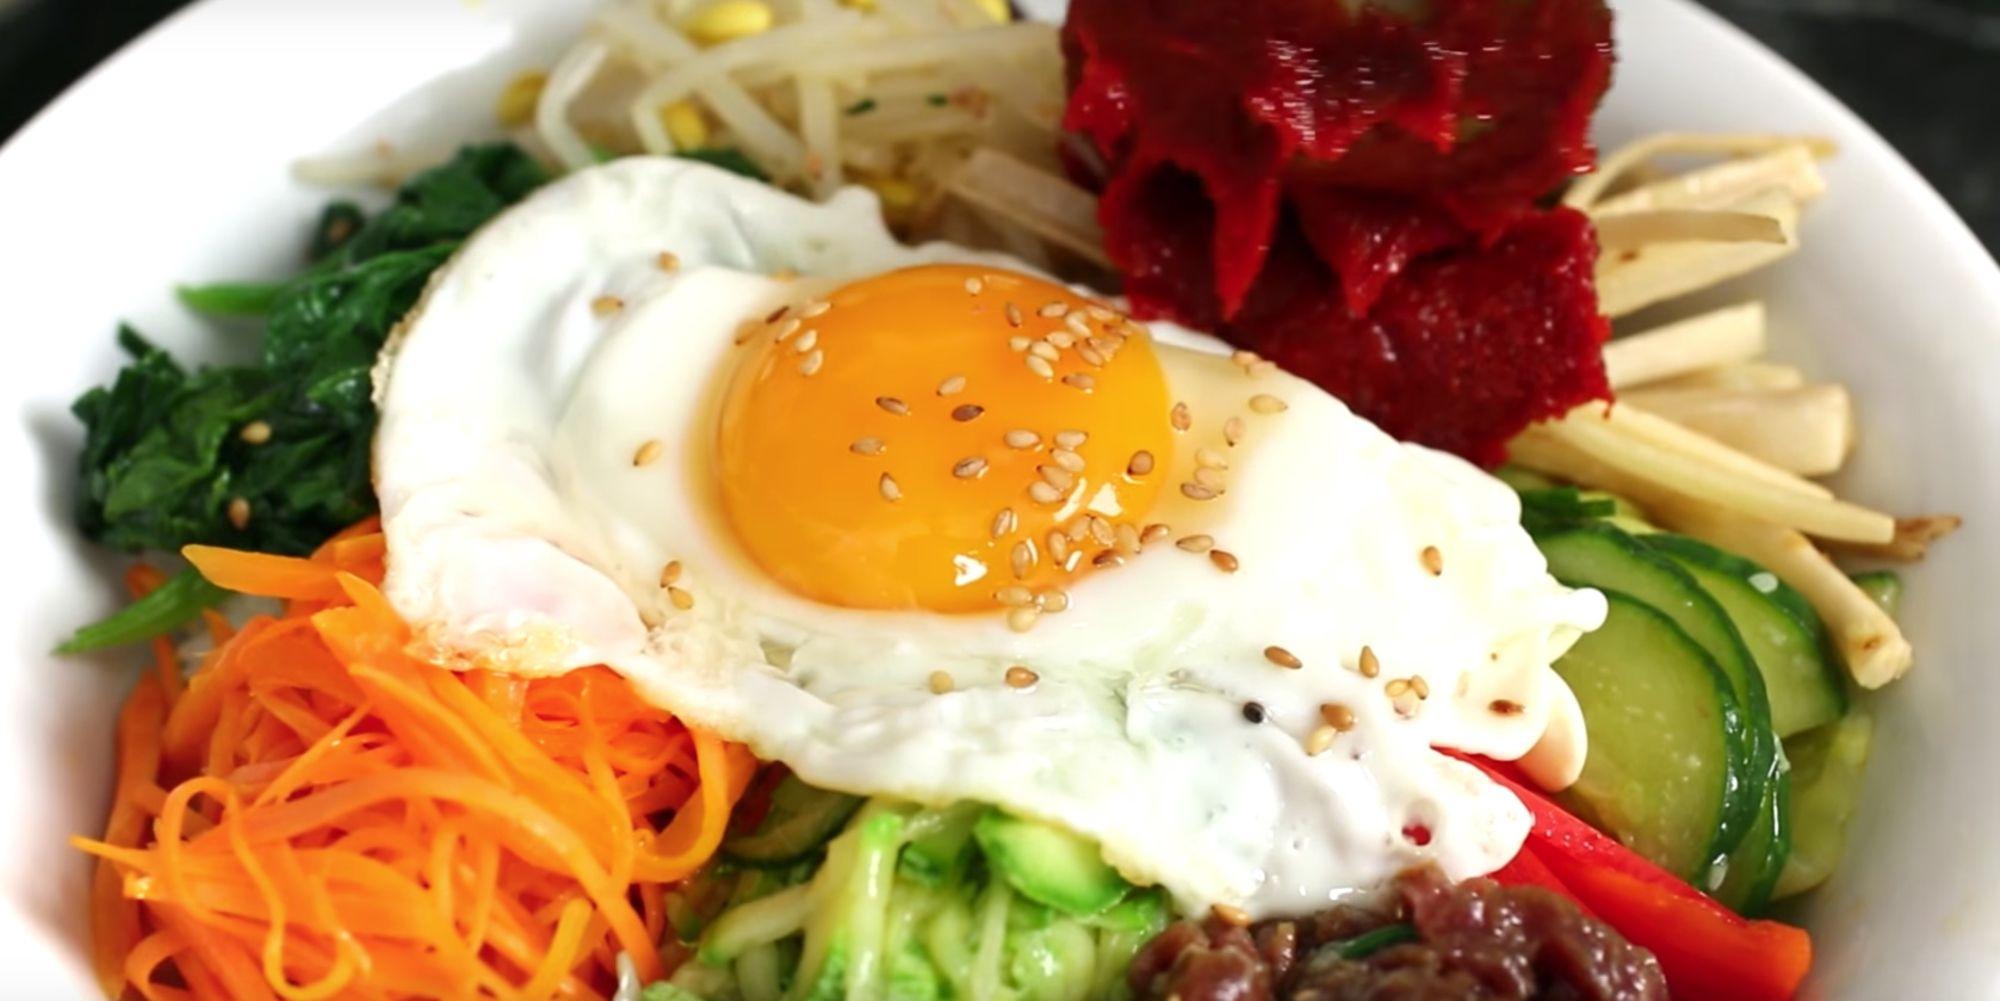 The Healthy Kitchen Cookbook